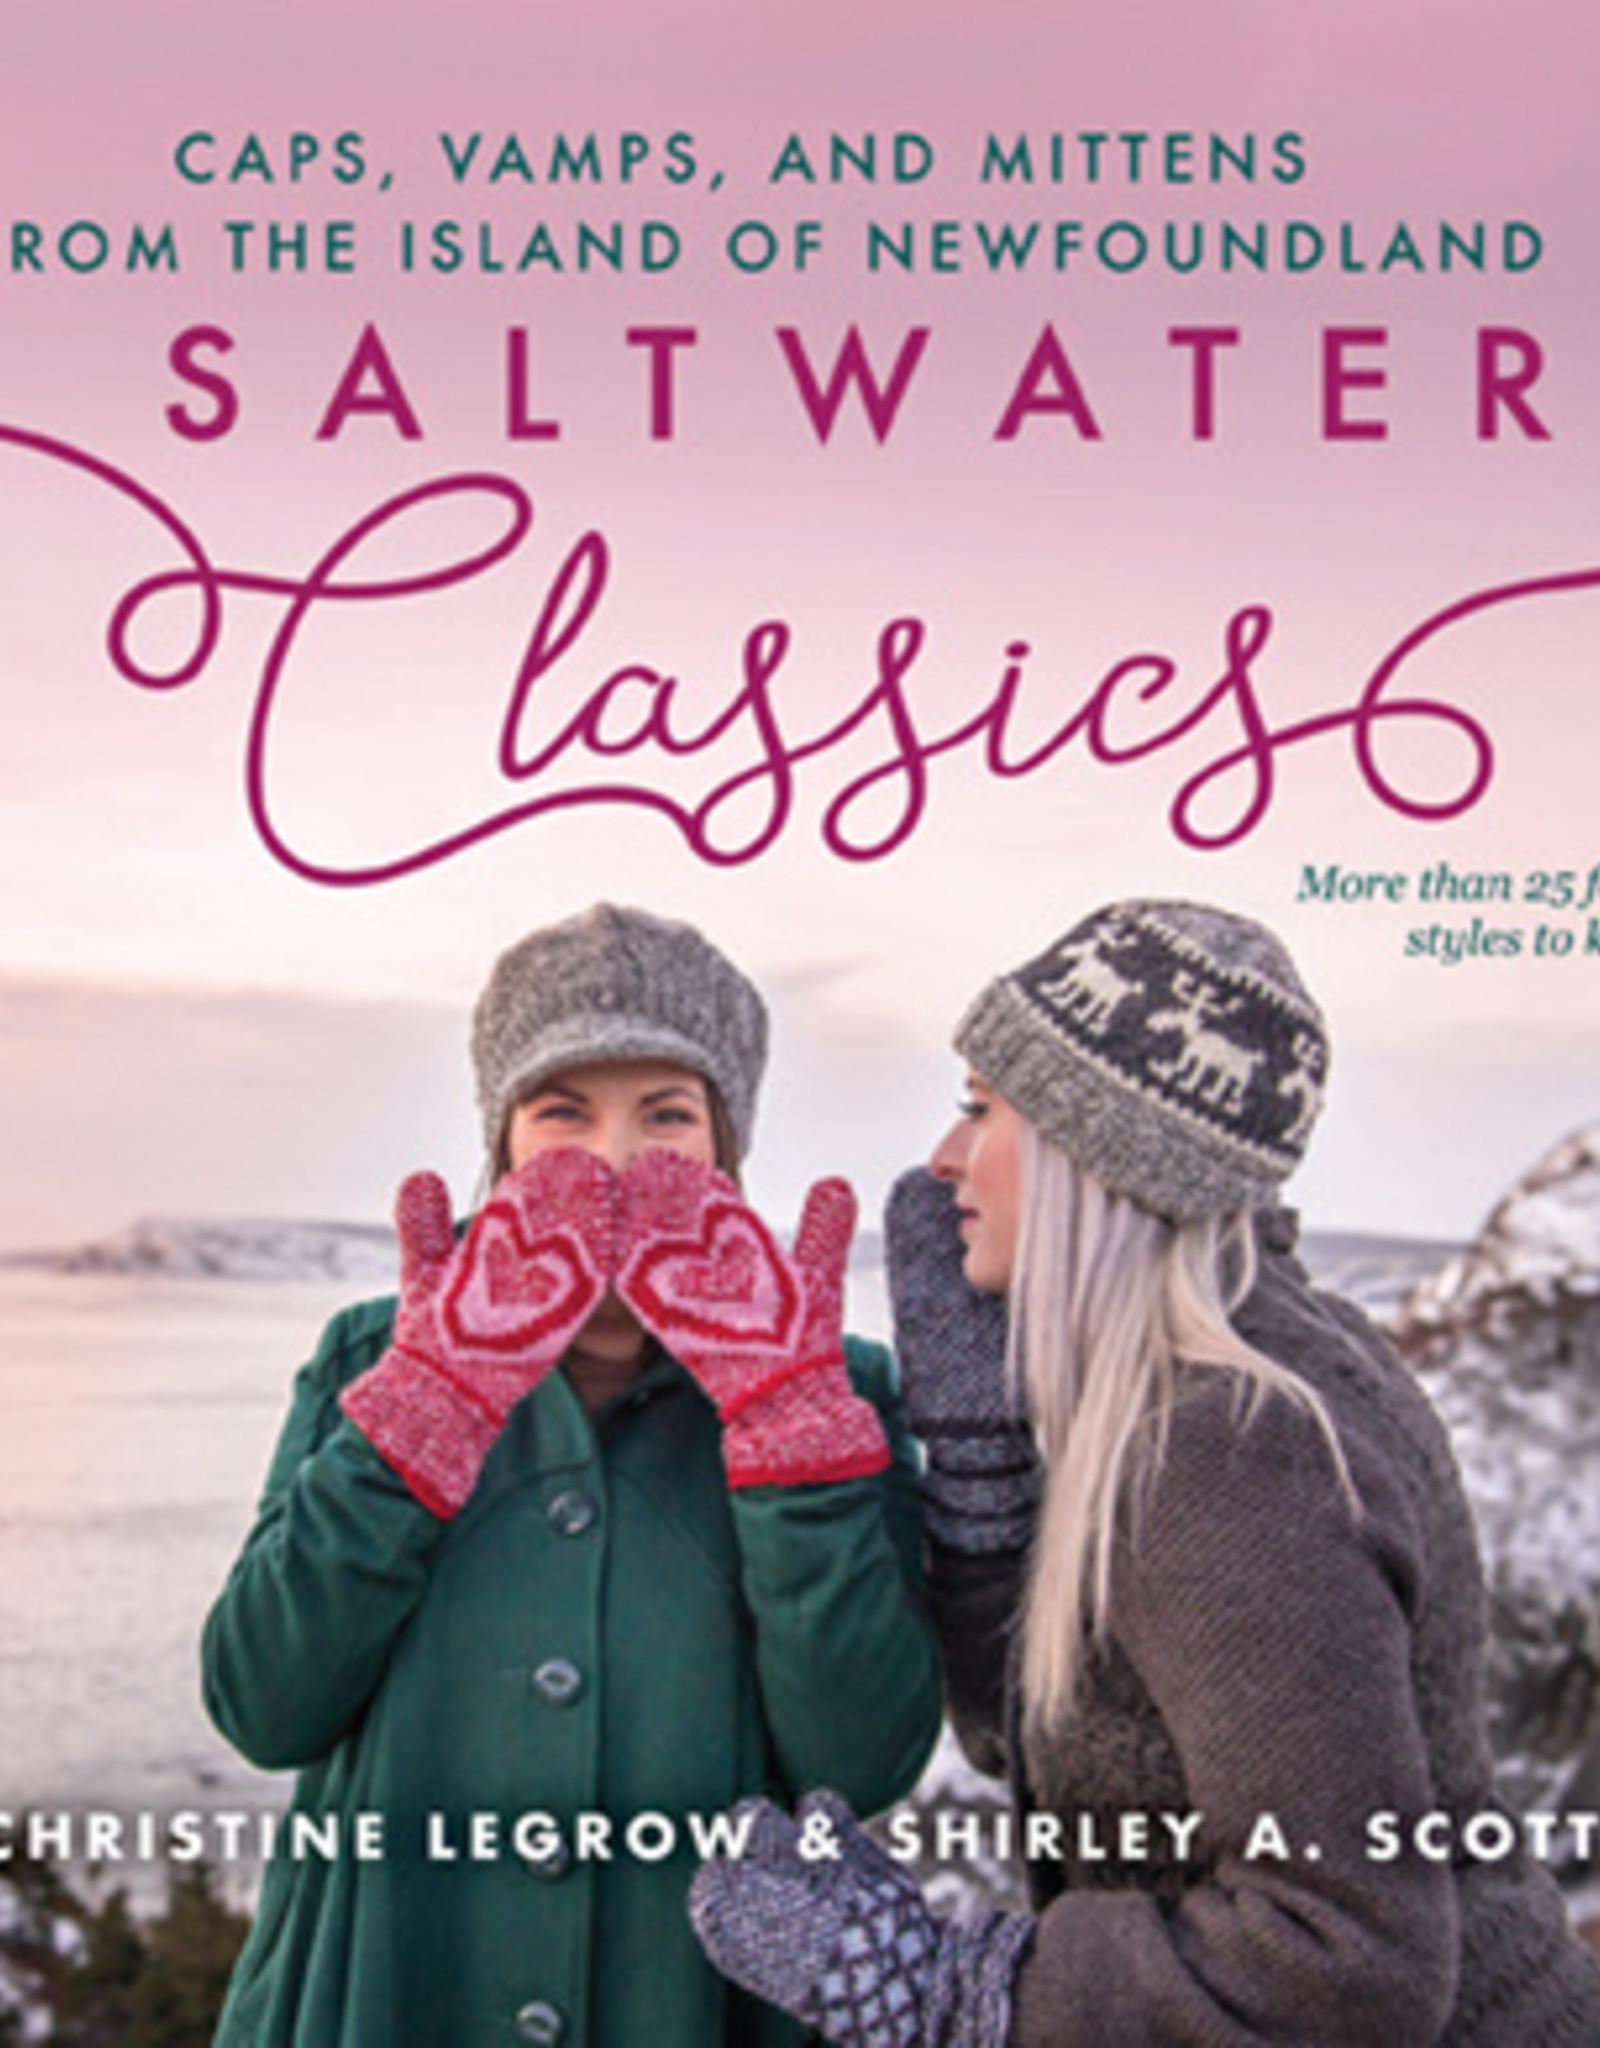 Saltwater Classics Book